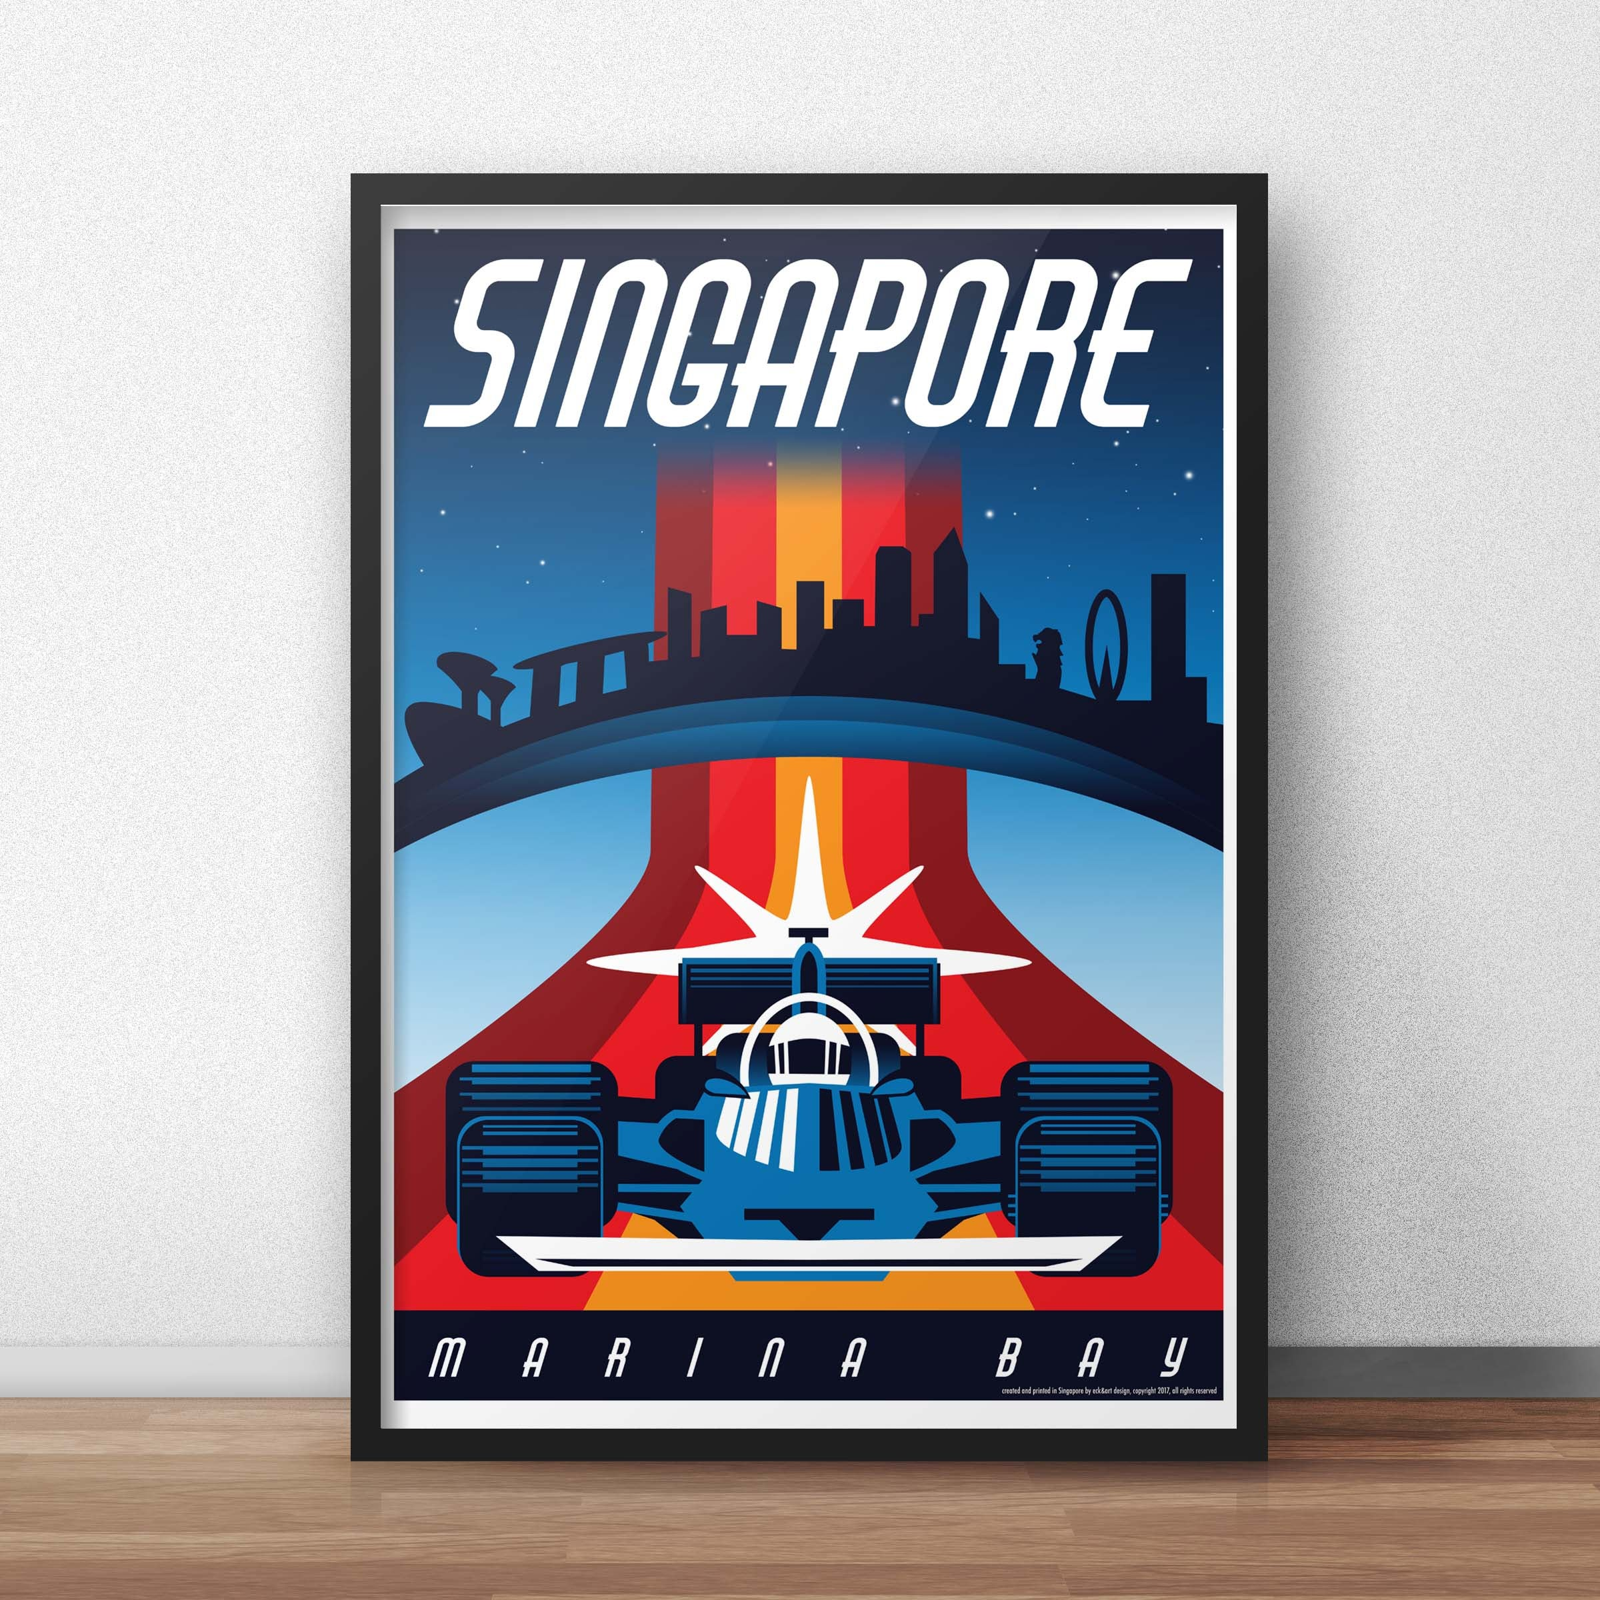 Eck Amp Art Designs Singapore Night Race Vintage Style Travel Poster